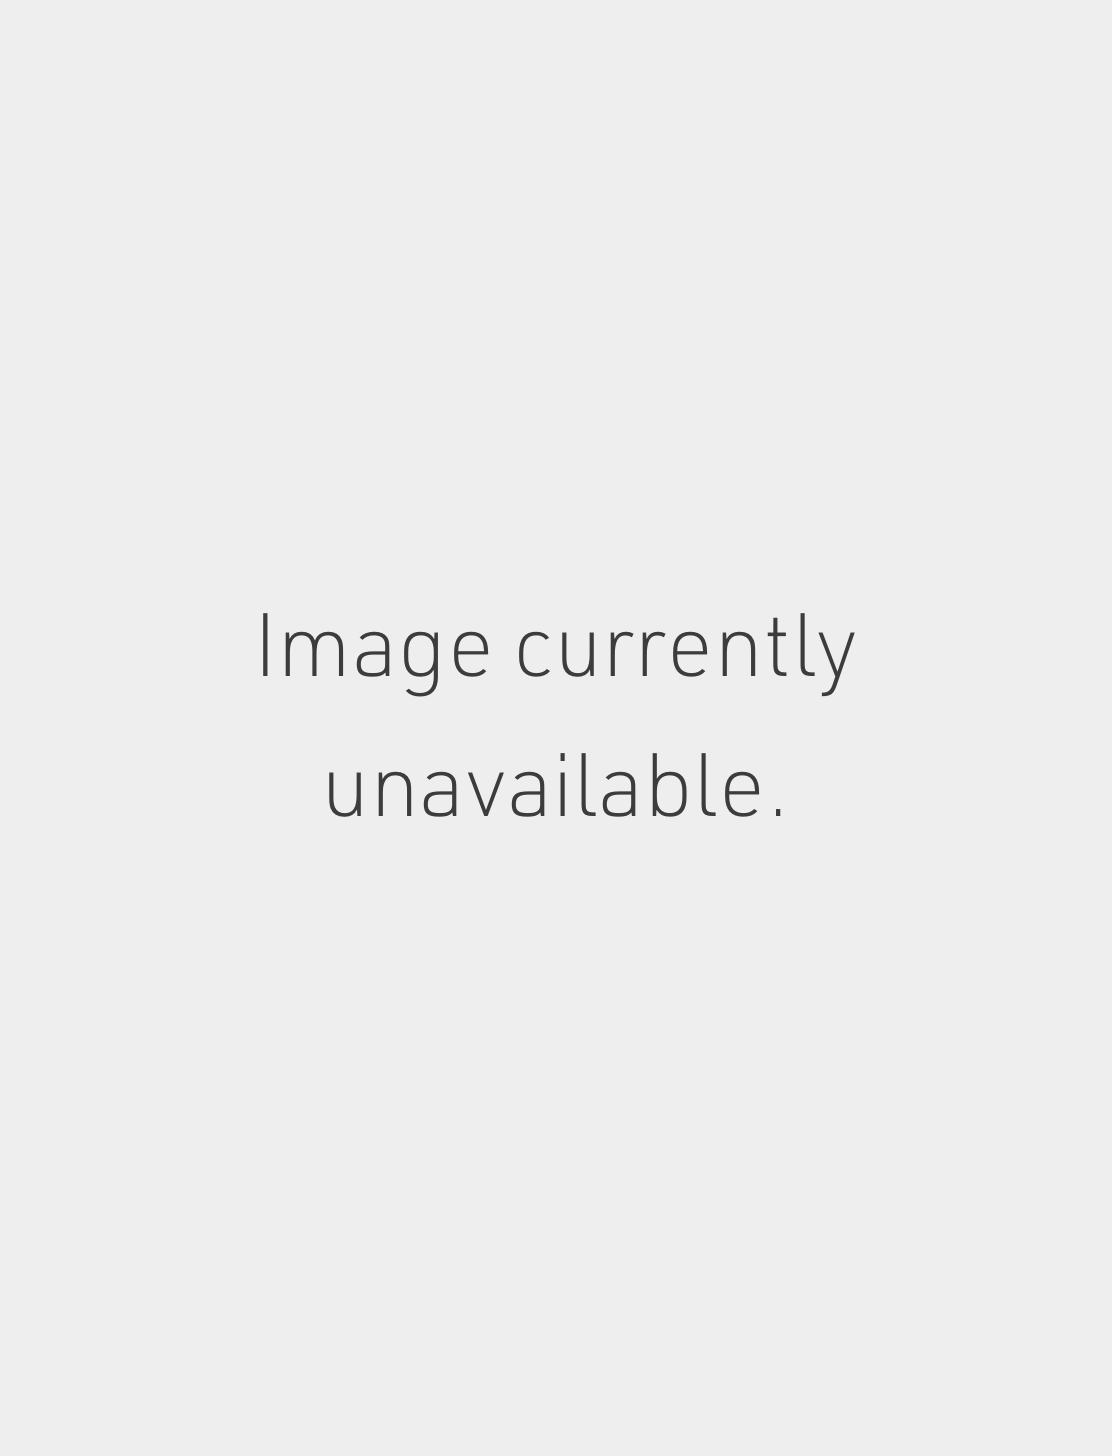 Diamond Halo Vintage Eye Necklace Image #1